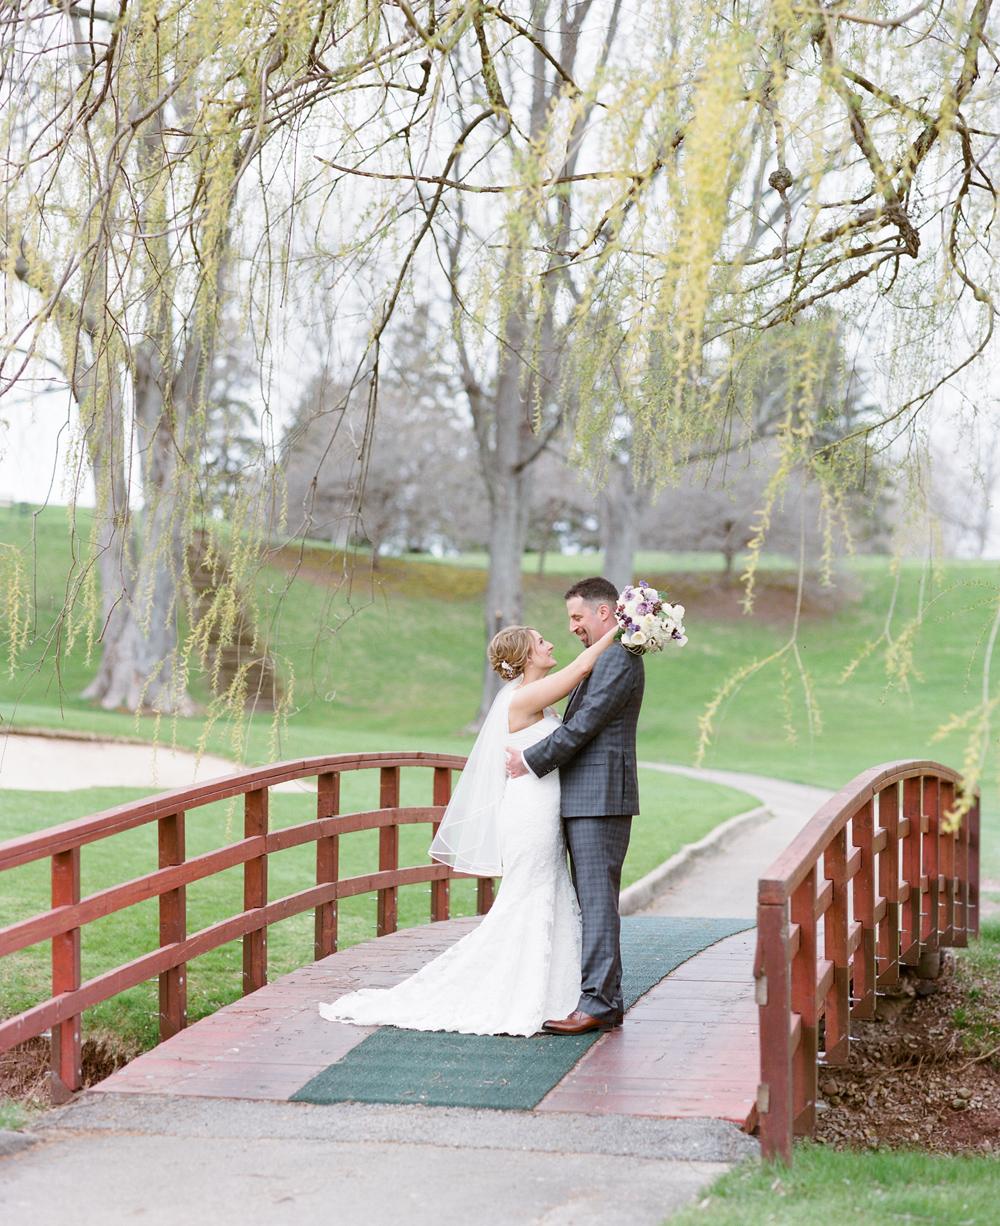 North_Shore_Golf_Club_Wedding_Photography_026.jpg